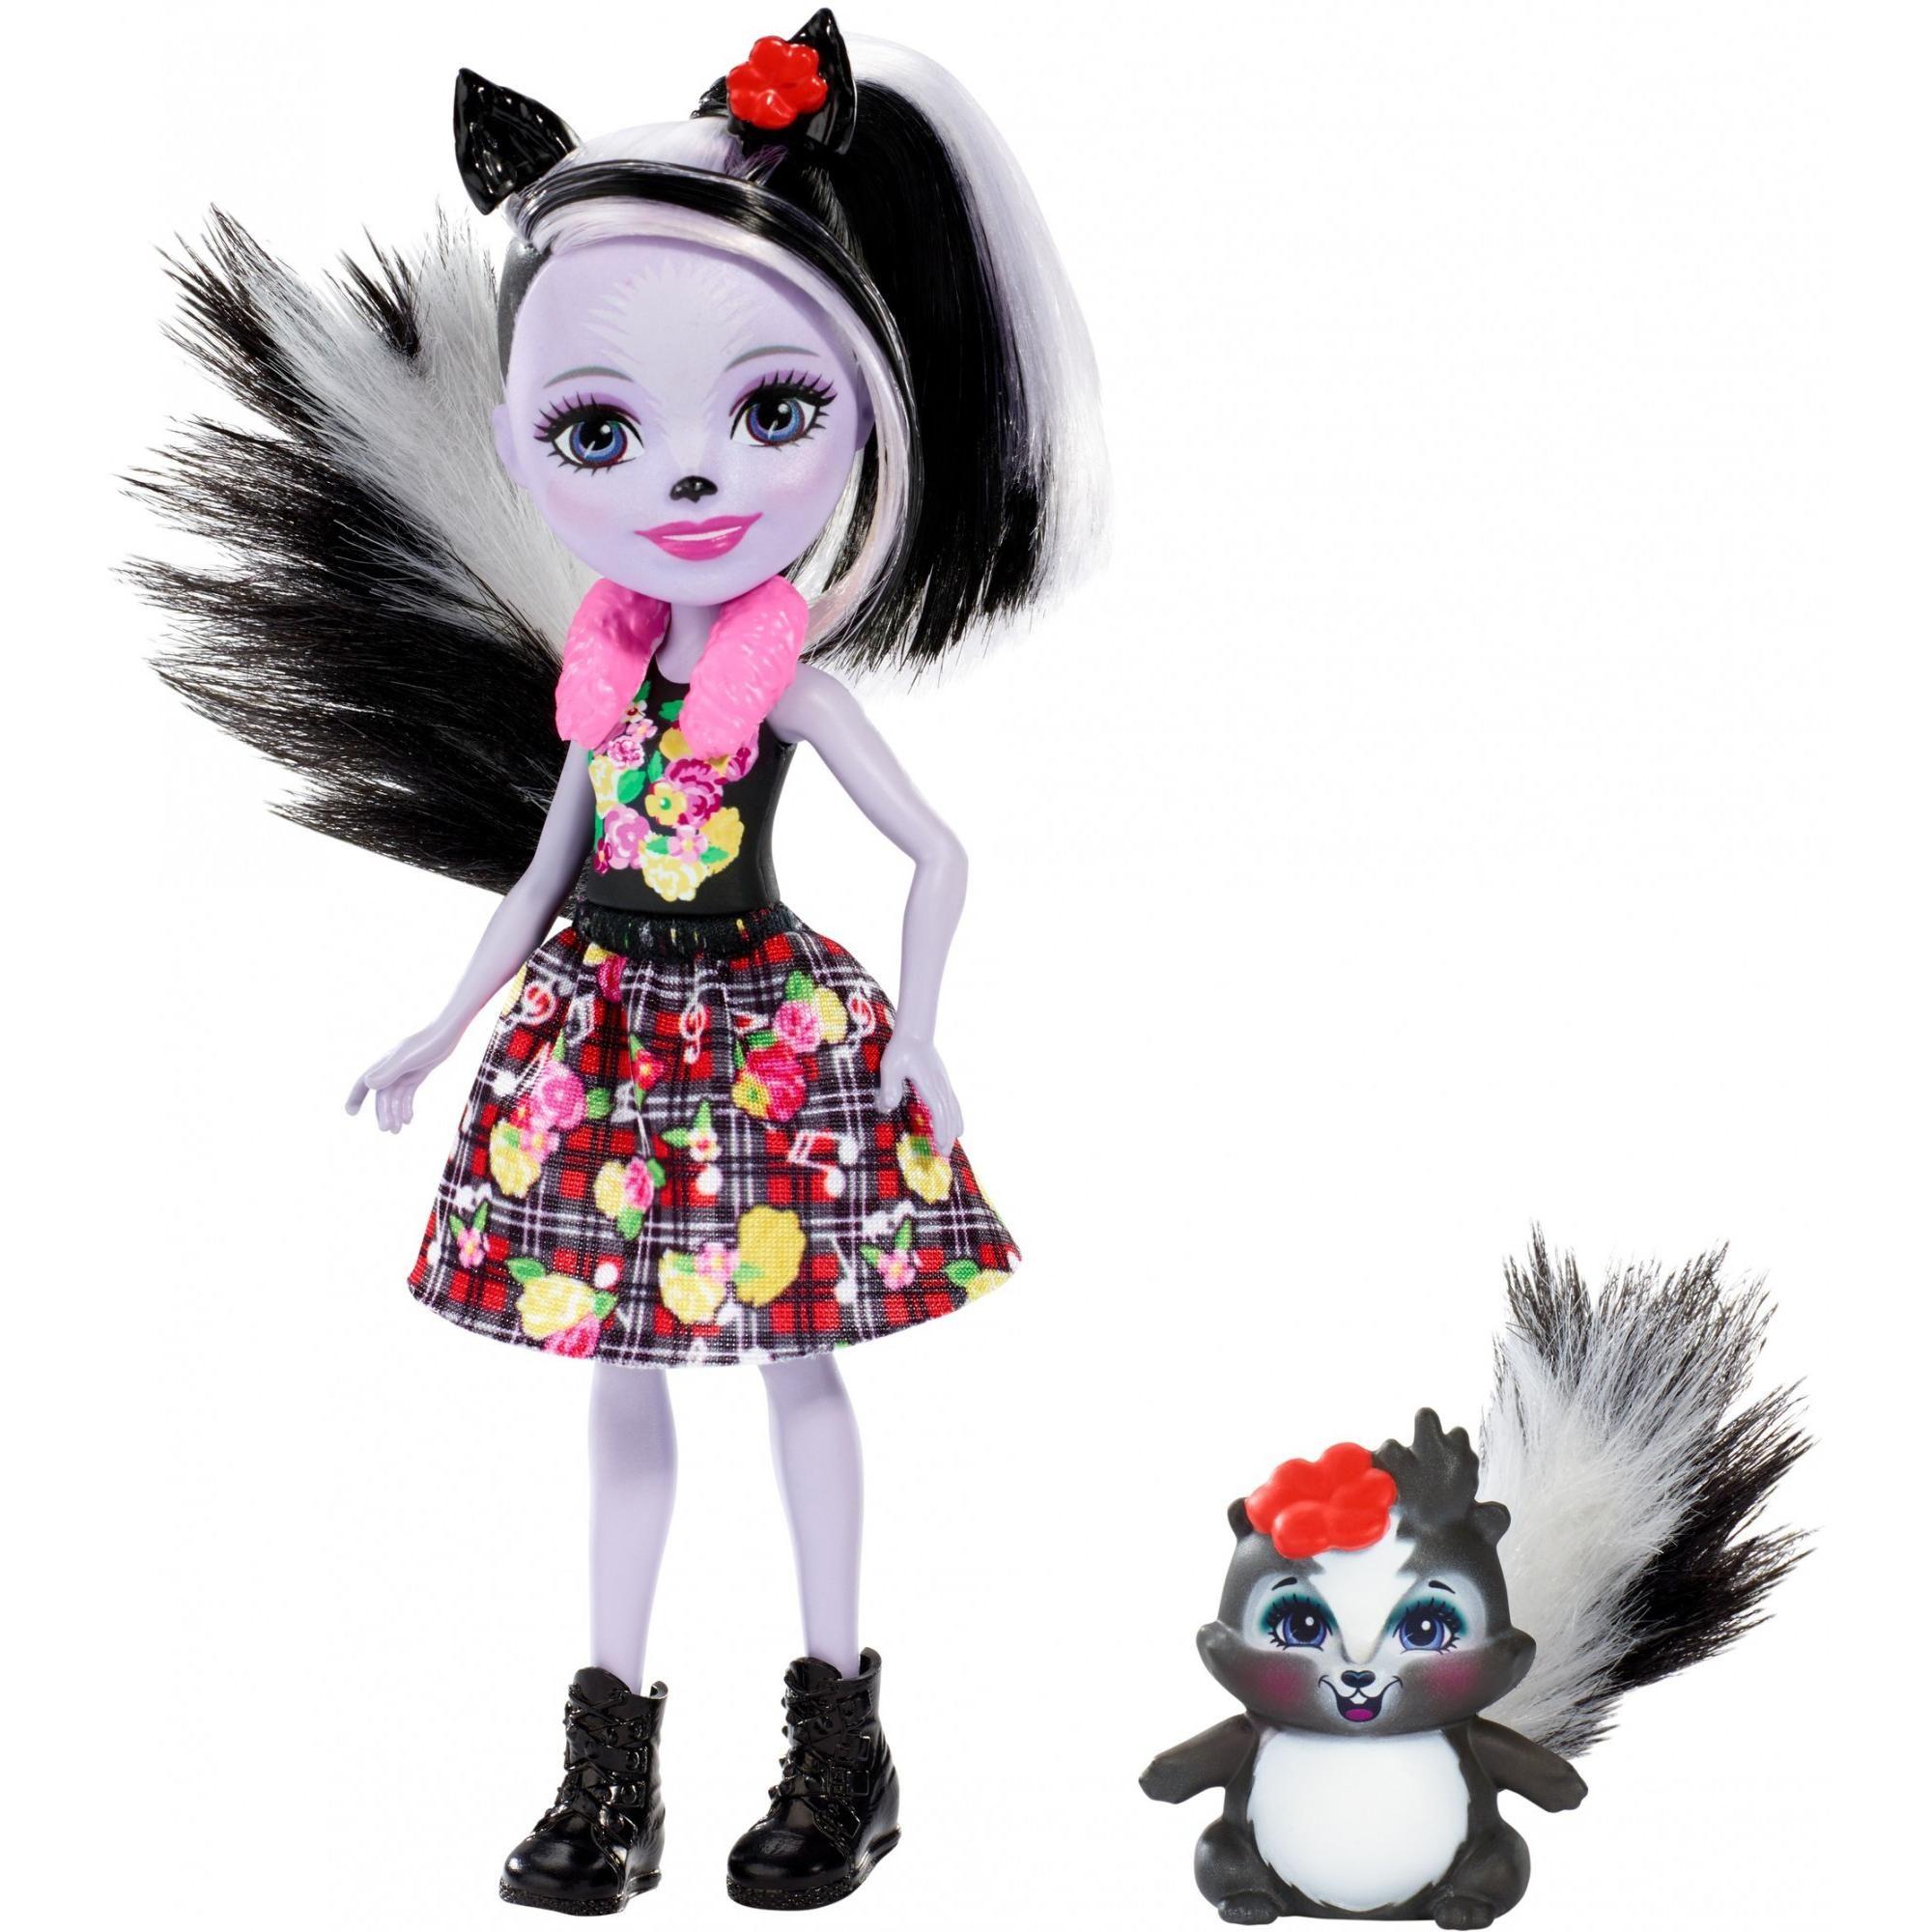 Enchantimals Sage Skunk Doll with Caper Skunk Friend